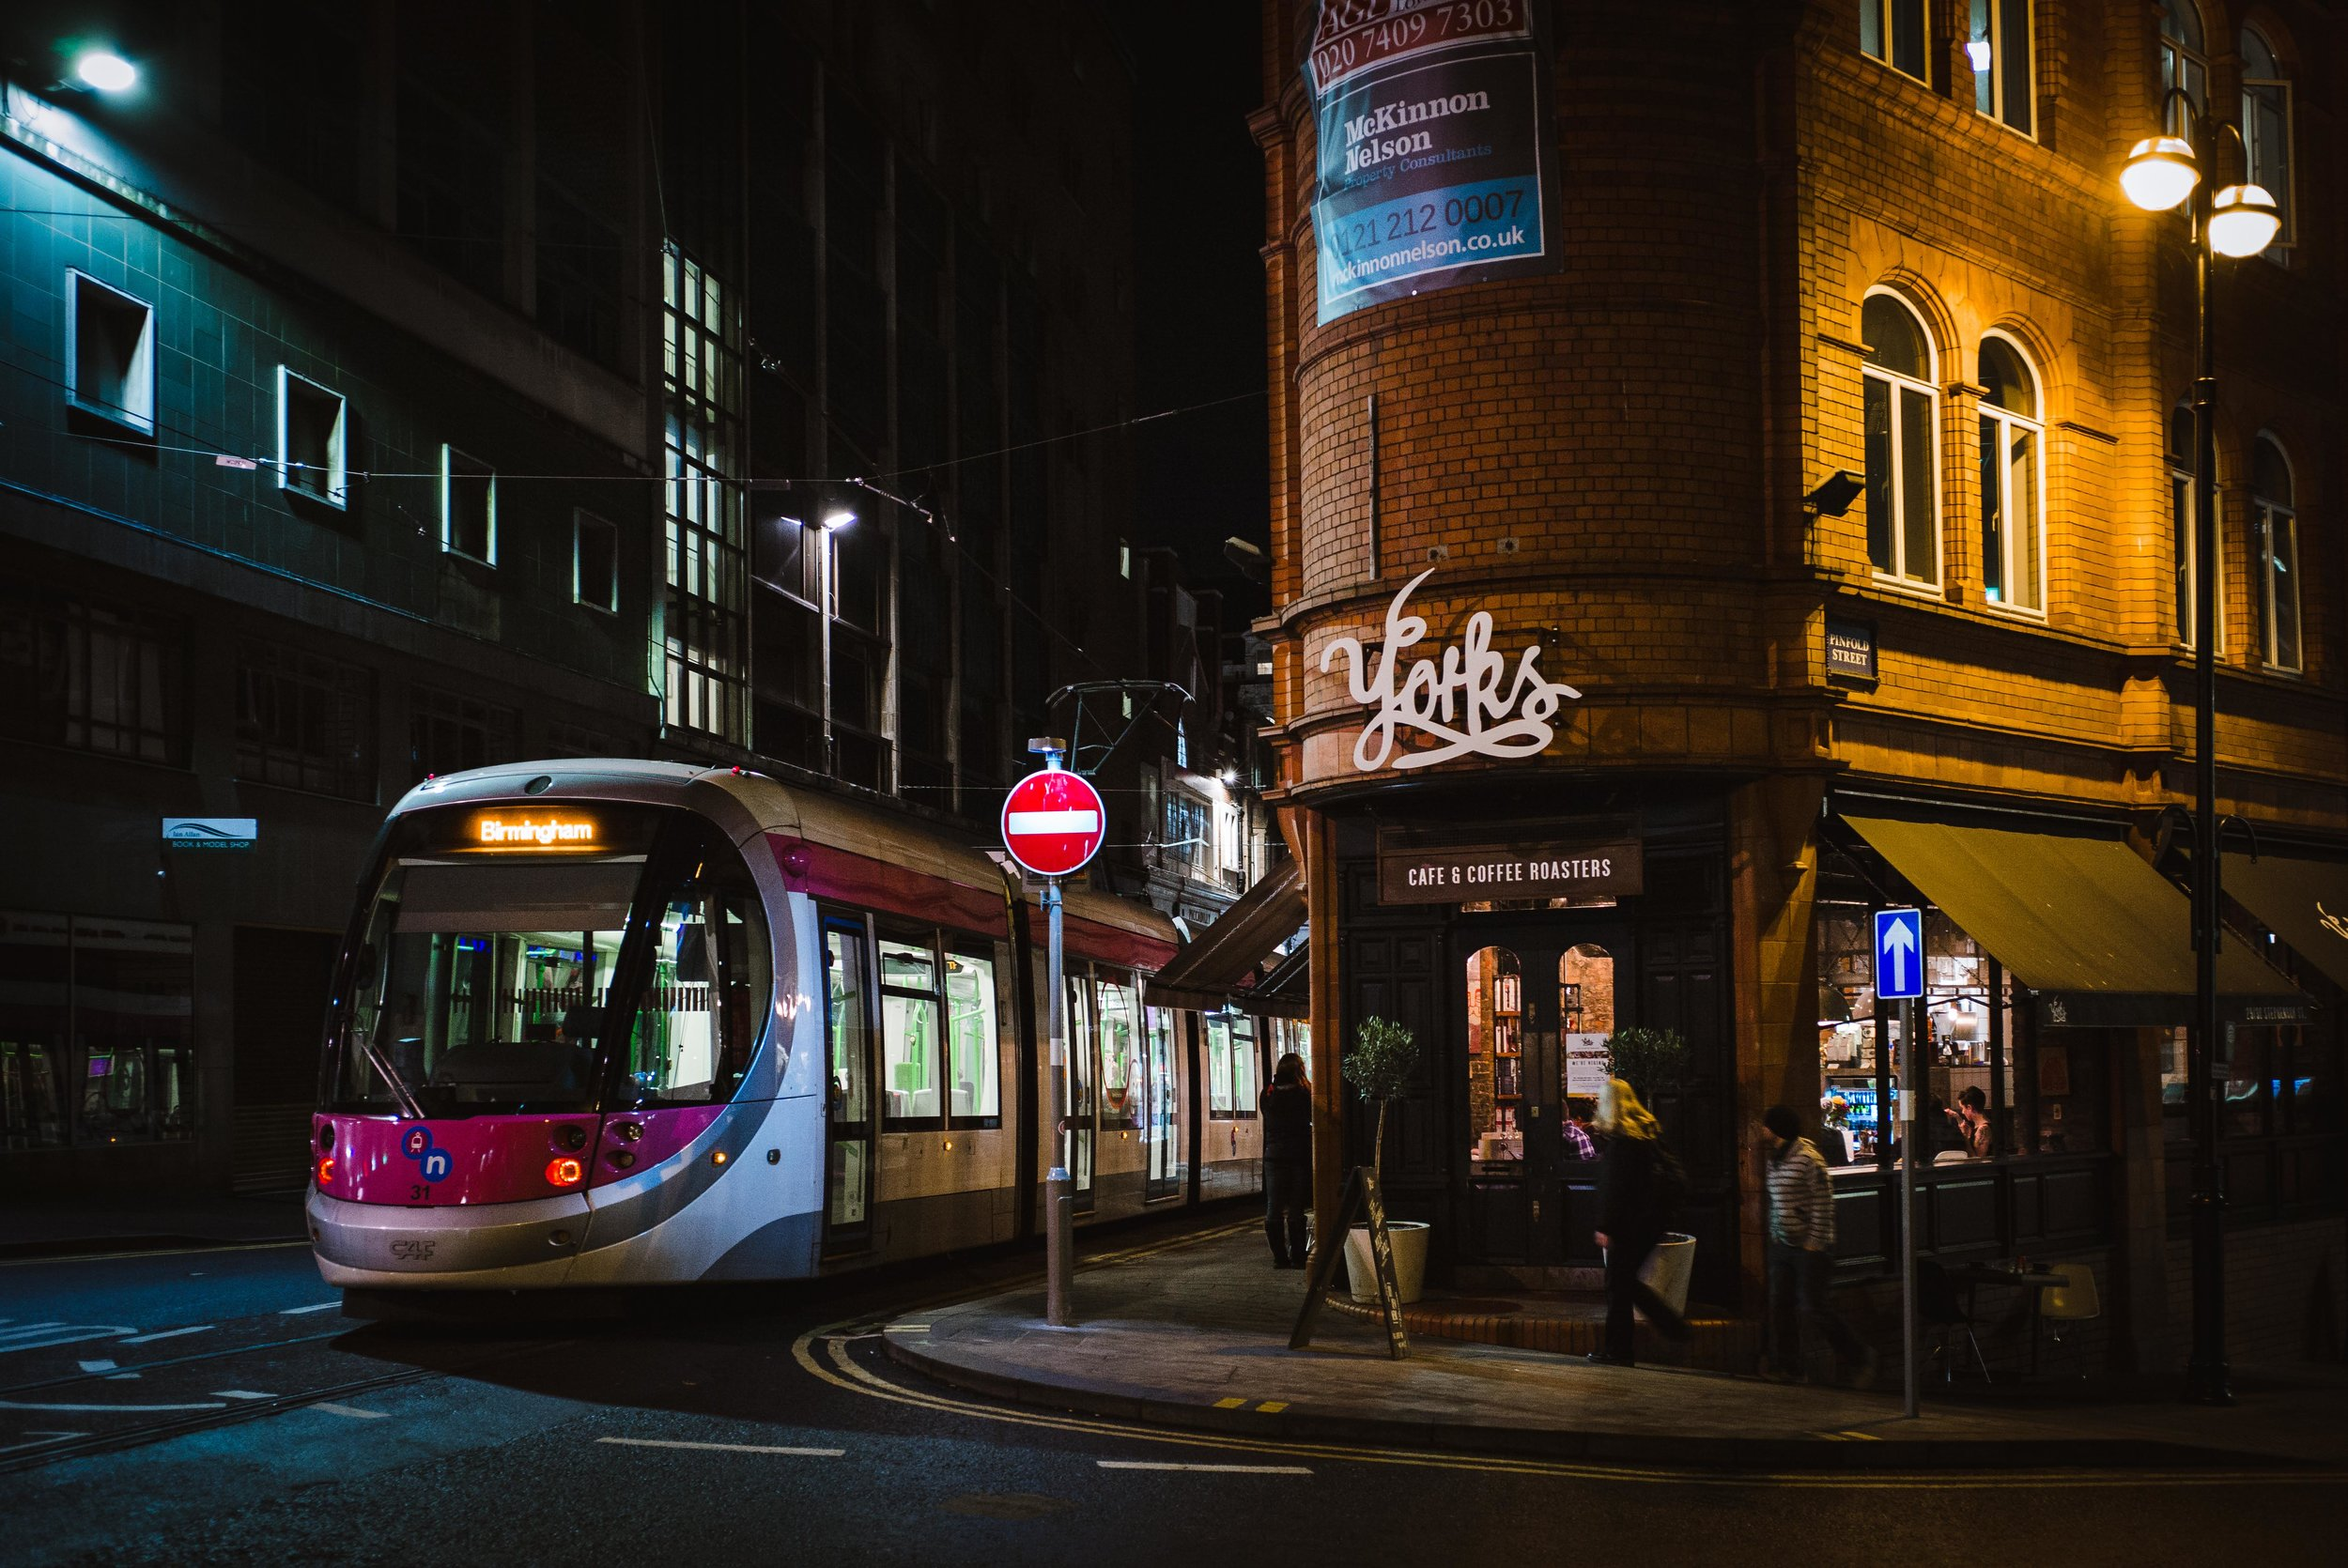 Yorks - Clifford Darby 2017